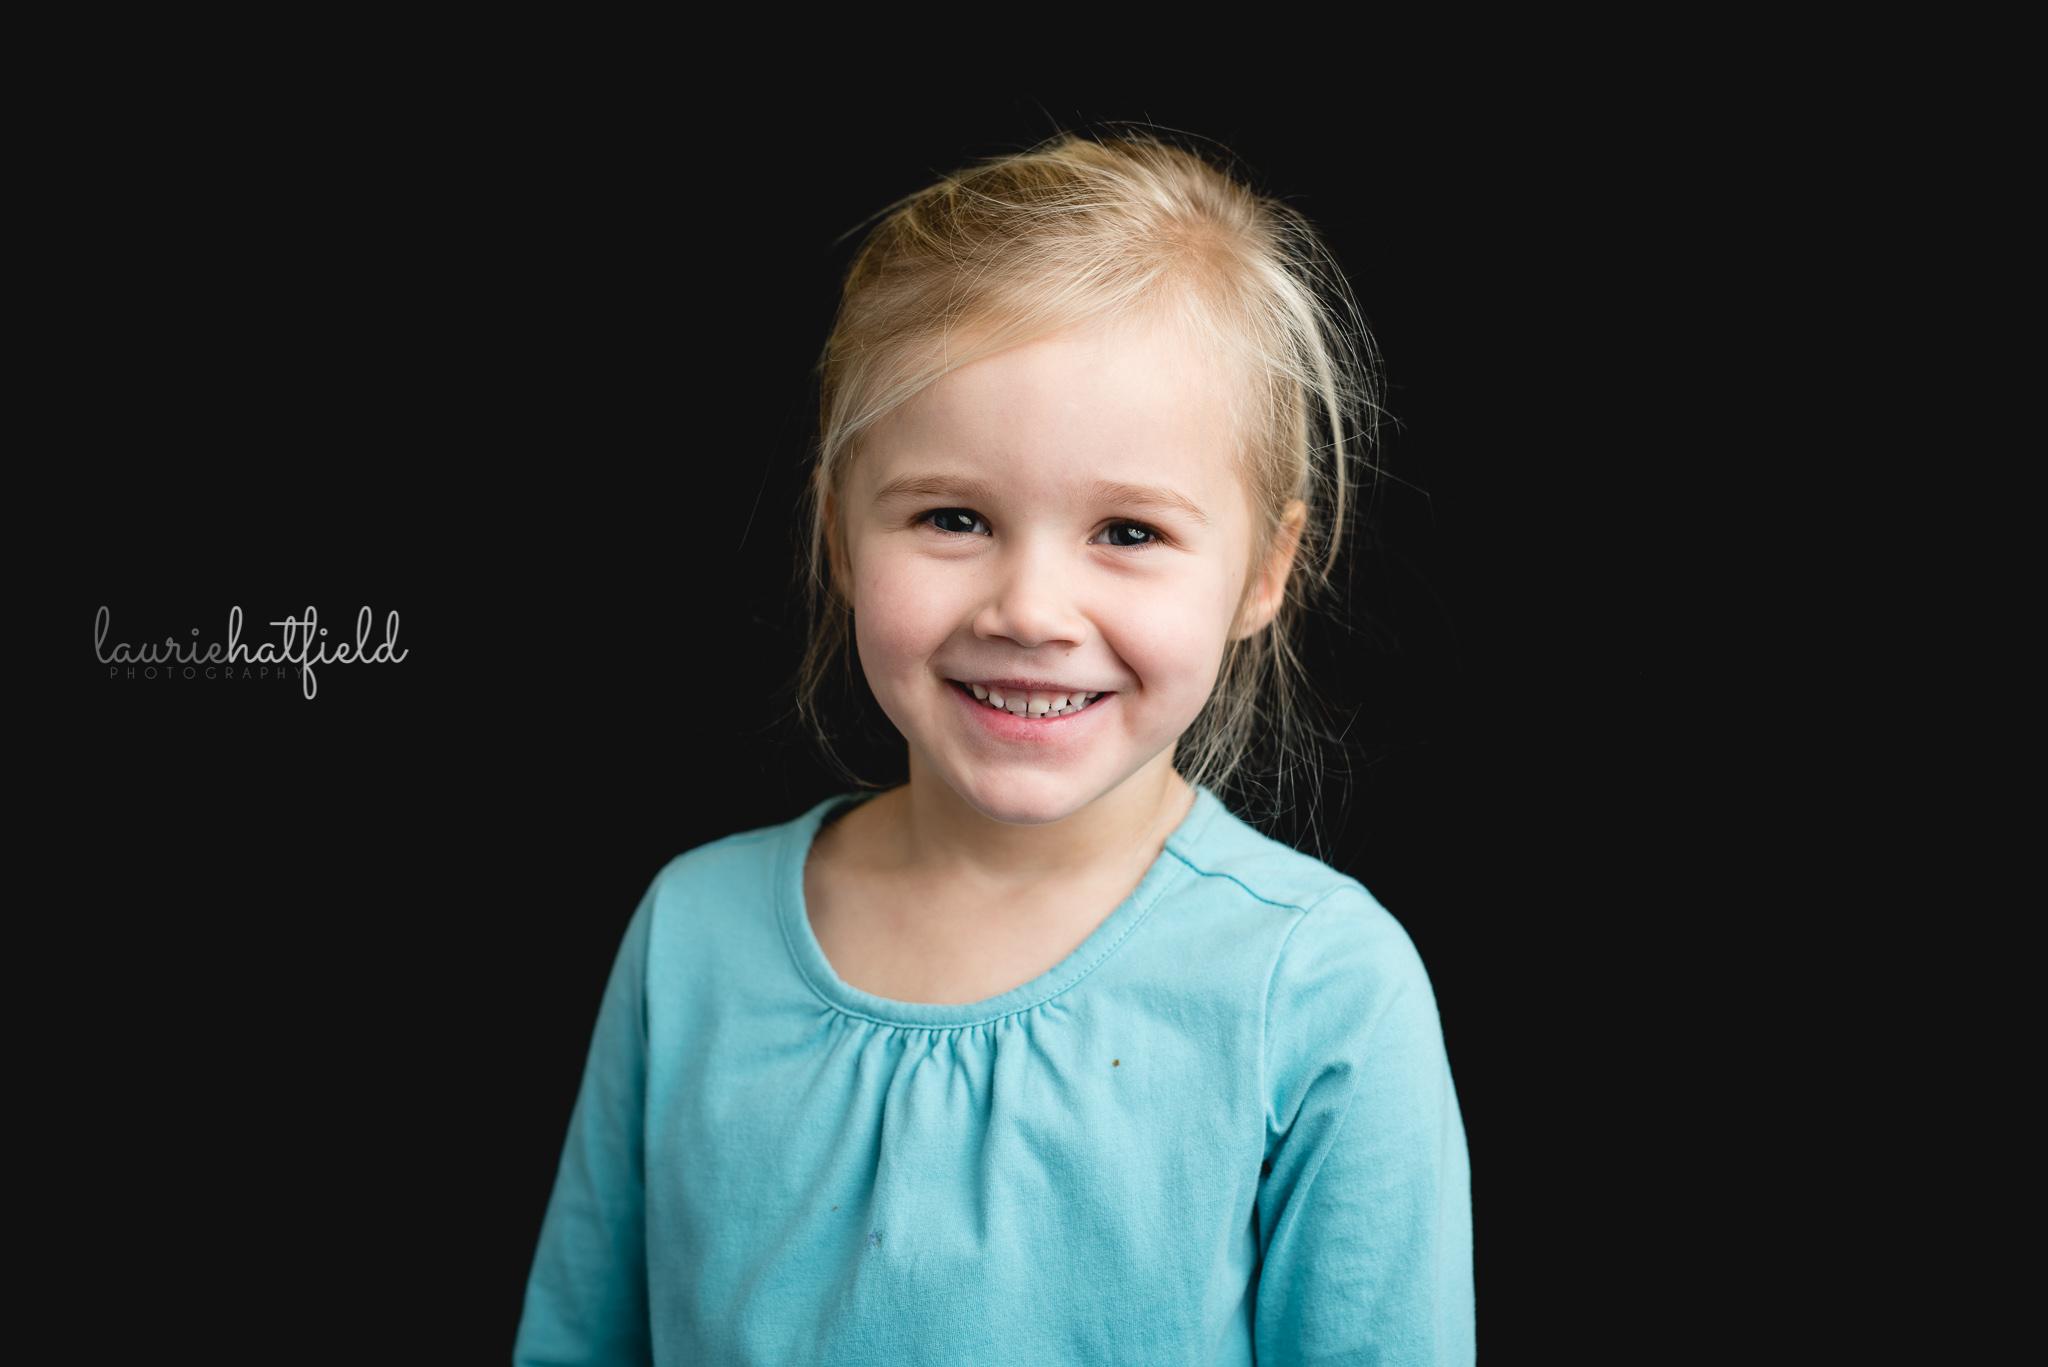 blonde girl in teal shirt | Huntsville AL school portraits